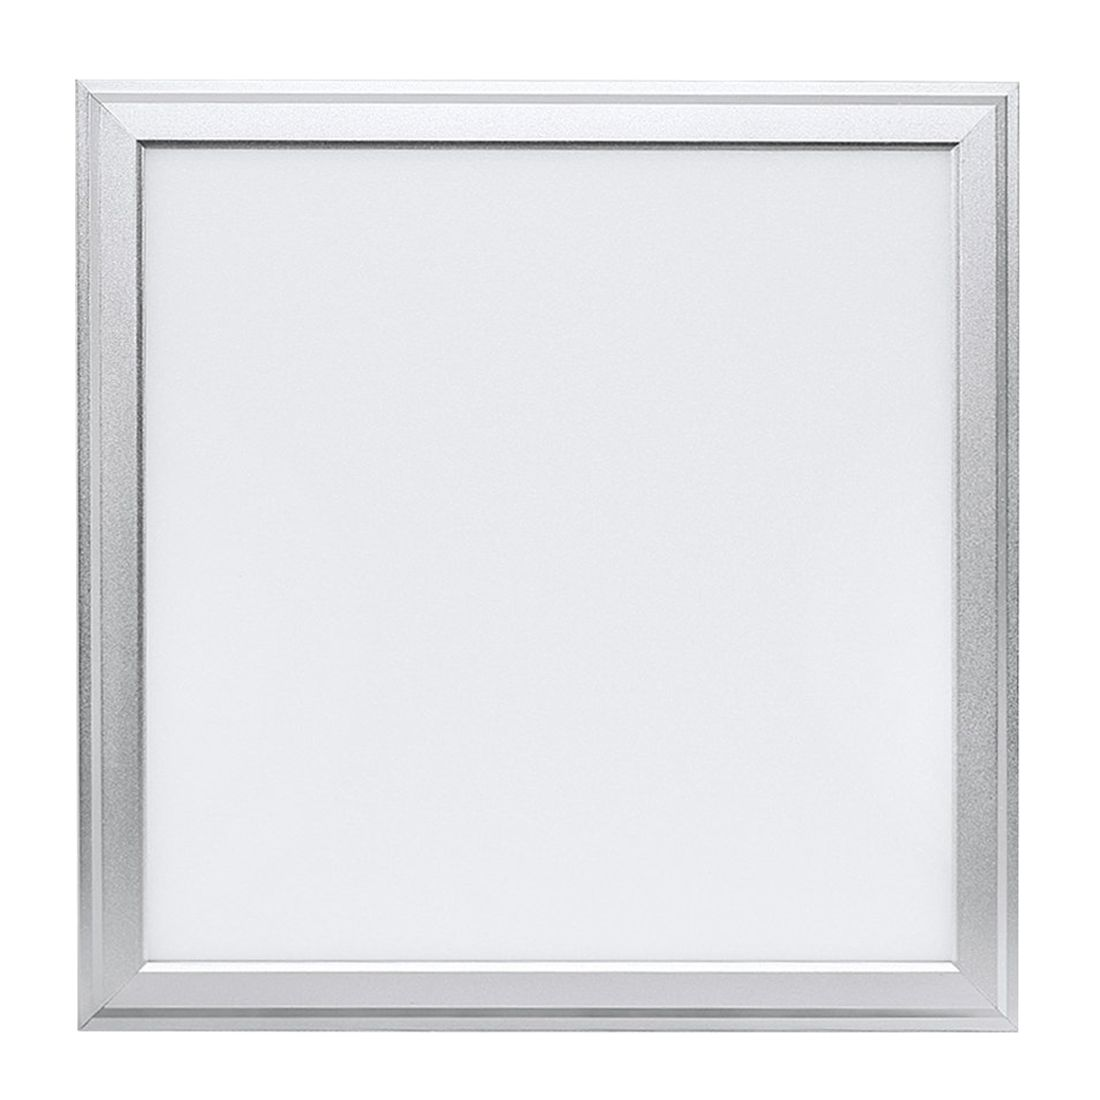 Ultraslim Square 30X30cm Daylight Warm White LED Panel Light Recessed Lamp Pendant Lights Ceiling Set (SMD 2835 ,2800K,18W) kinfire circular 6w 420lm 6500k 30 x smd 3528 led white light ceiling lamp w driver ac 85 265v